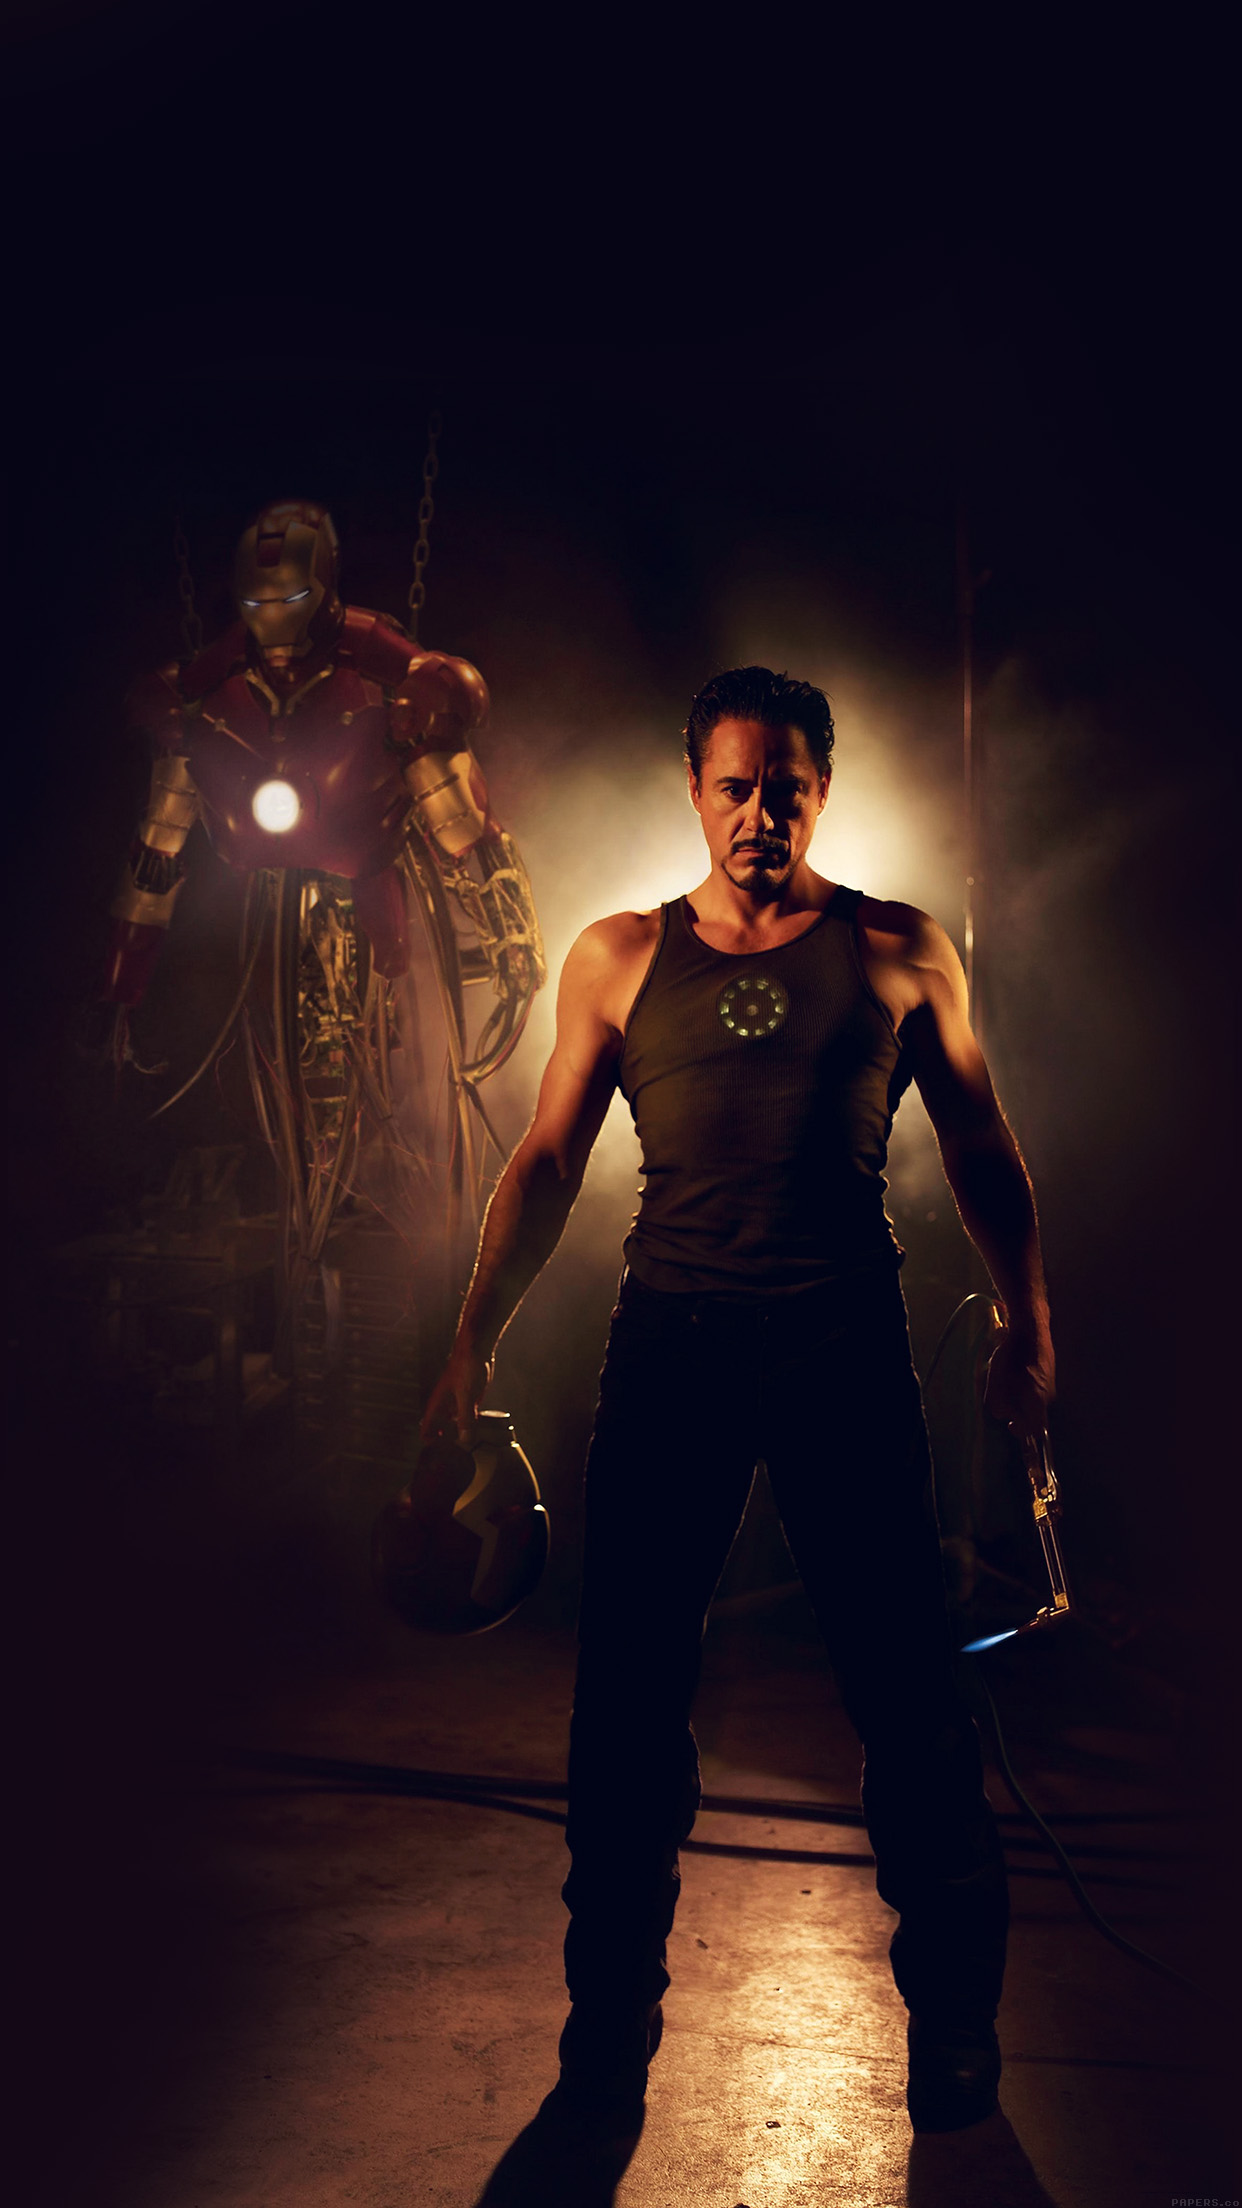 Ironman Avengers Art Robert Downey Jr Film Hero Android Wallpaper Android Hd Wallpapers